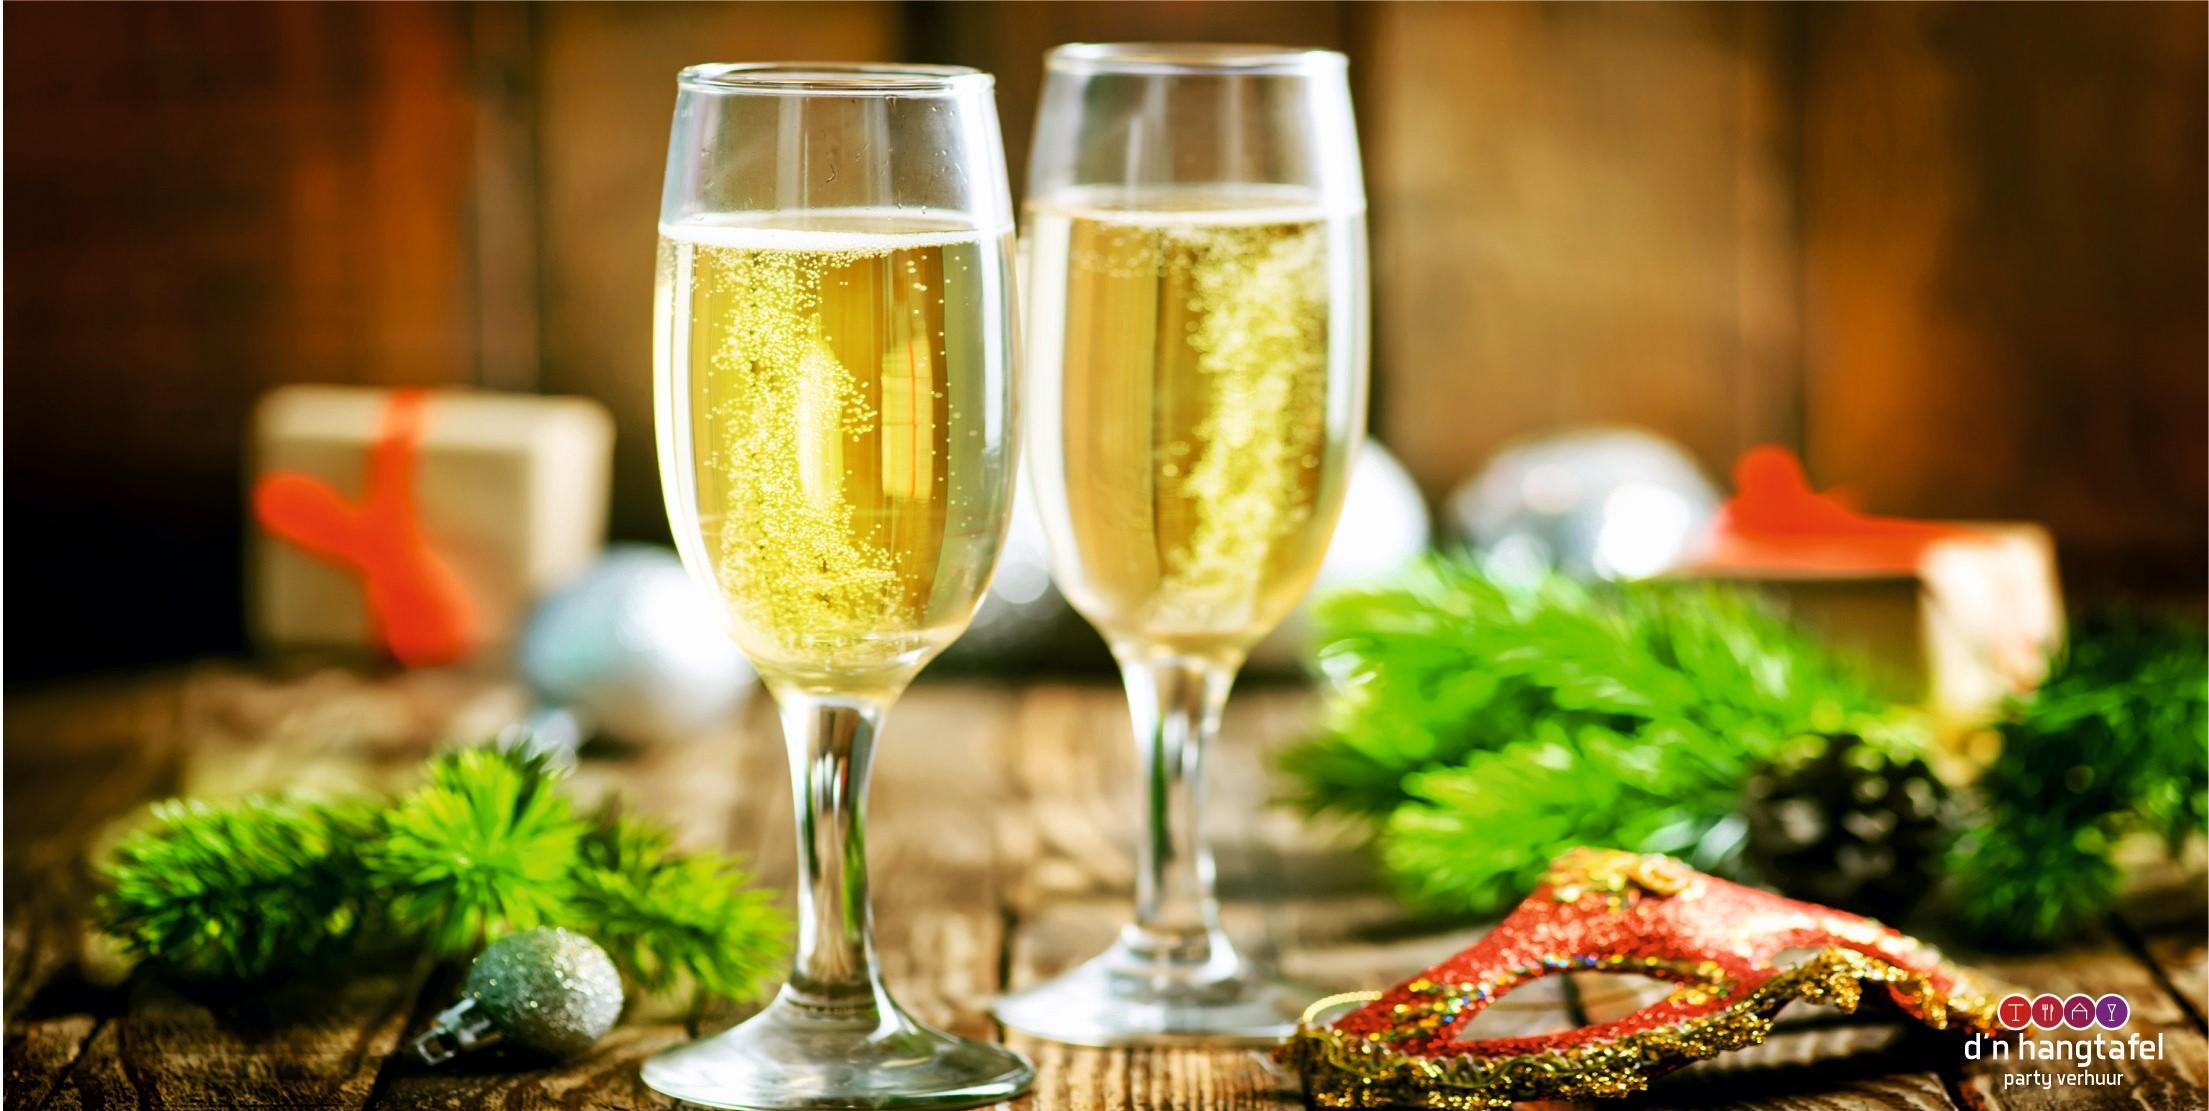 Bouwhek met kerst thema doek (champagne)